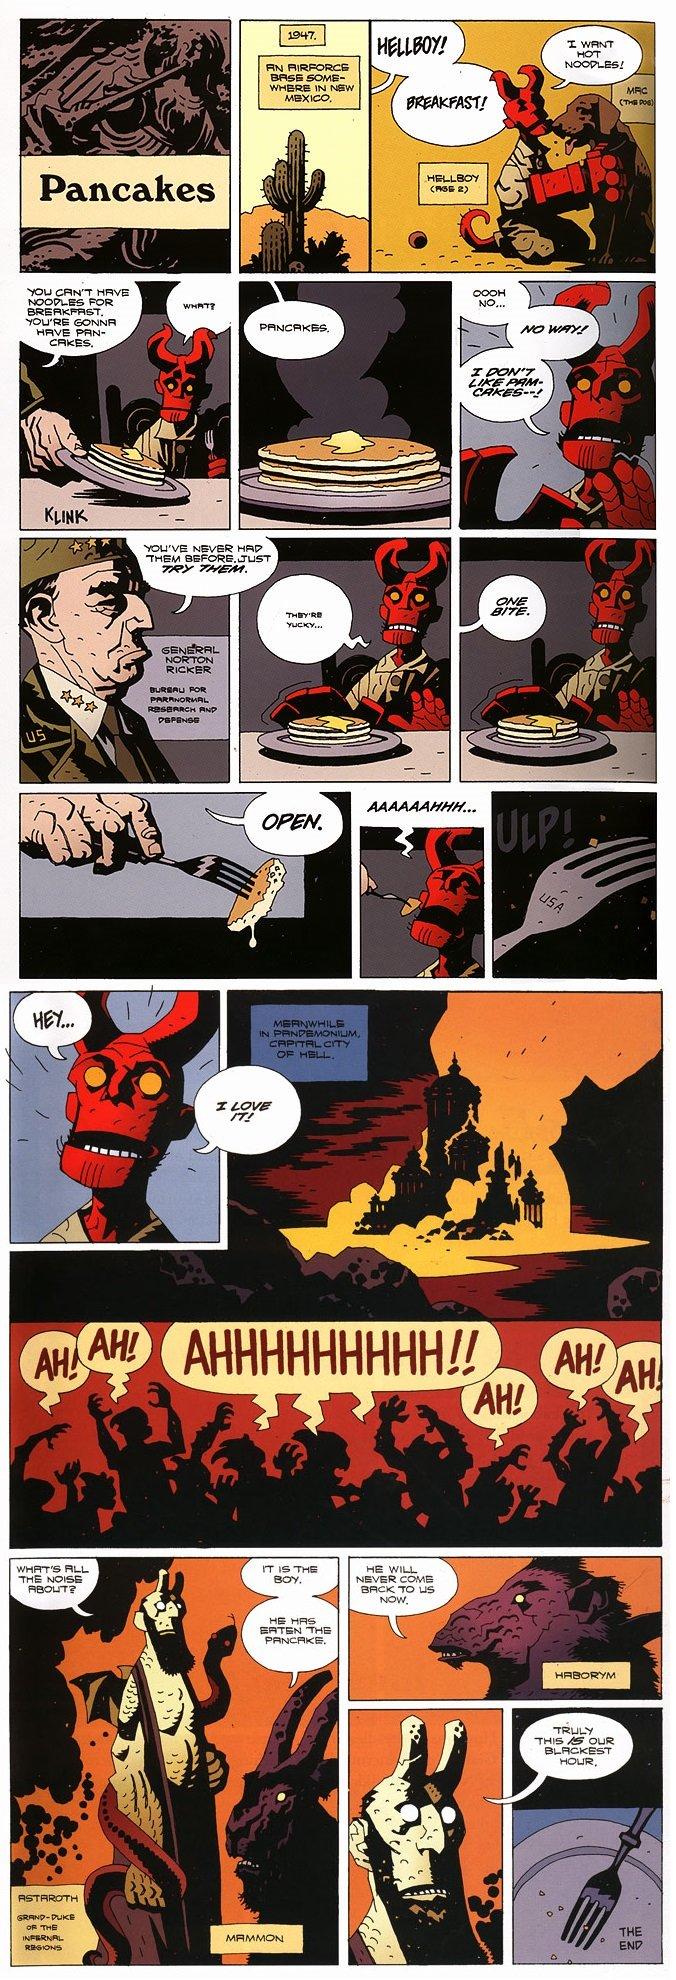 "Hellboy eats earth food. . Pancakes ilana-. FUR idm CERES. f Each: TD 14: 1 ENTER] ""THE neus .5 DUE.' Hana,. might be useful Hellboy eats earth food Pancakes ilana- FUR idm CERES f Each: TD 14: 1 ENTER] ""THE neus 5 DUE ' Hana might be useful"